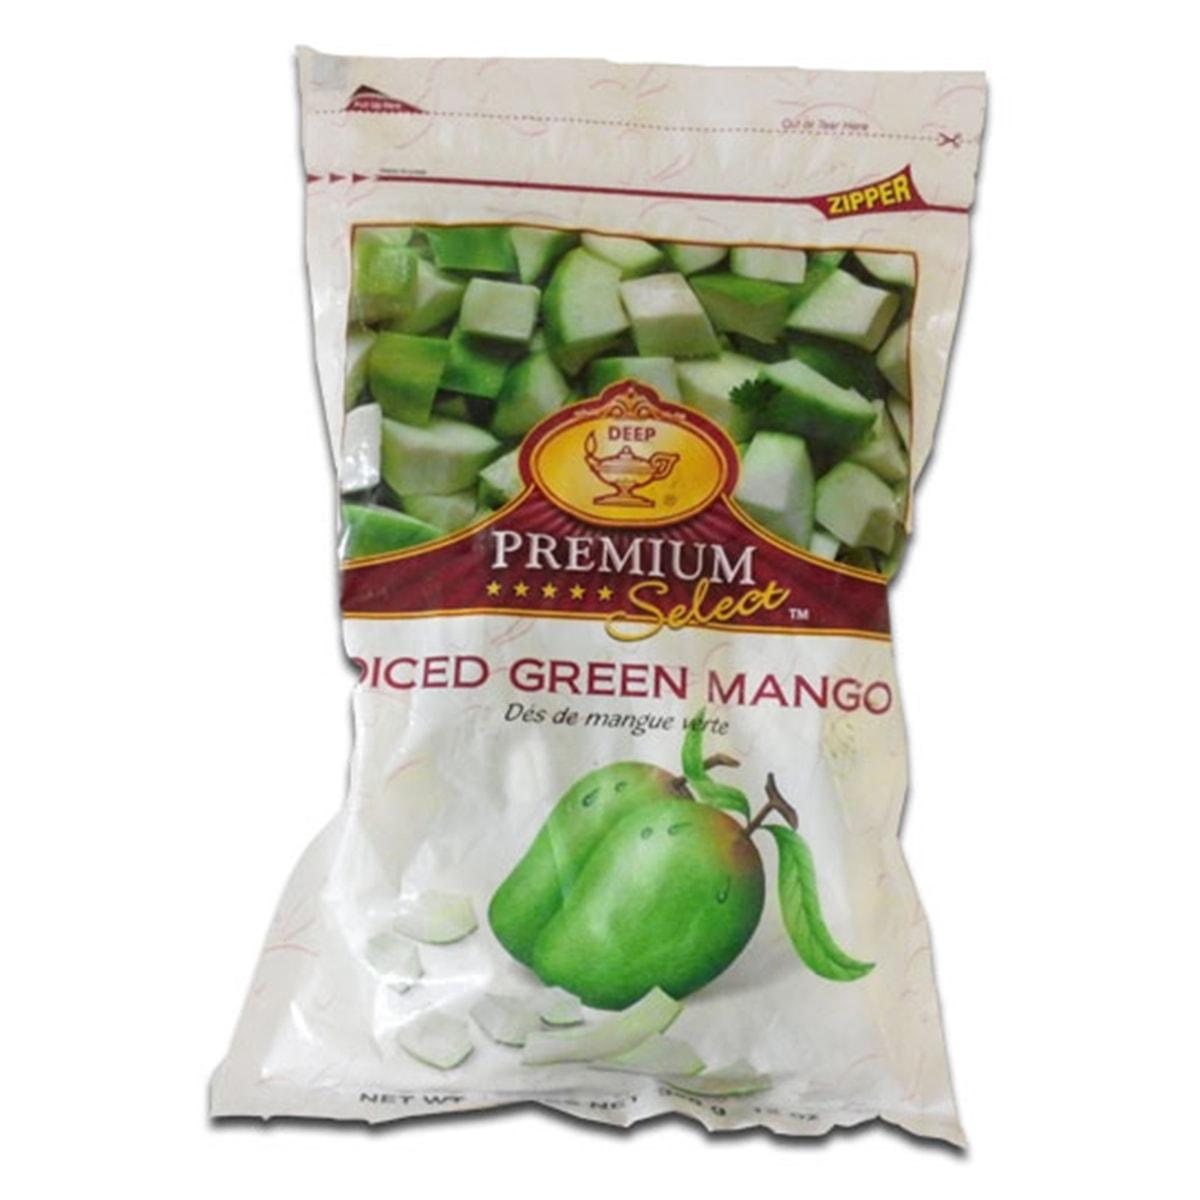 Buy Deep Foods Diced Green Mango Frozen - 340 gm